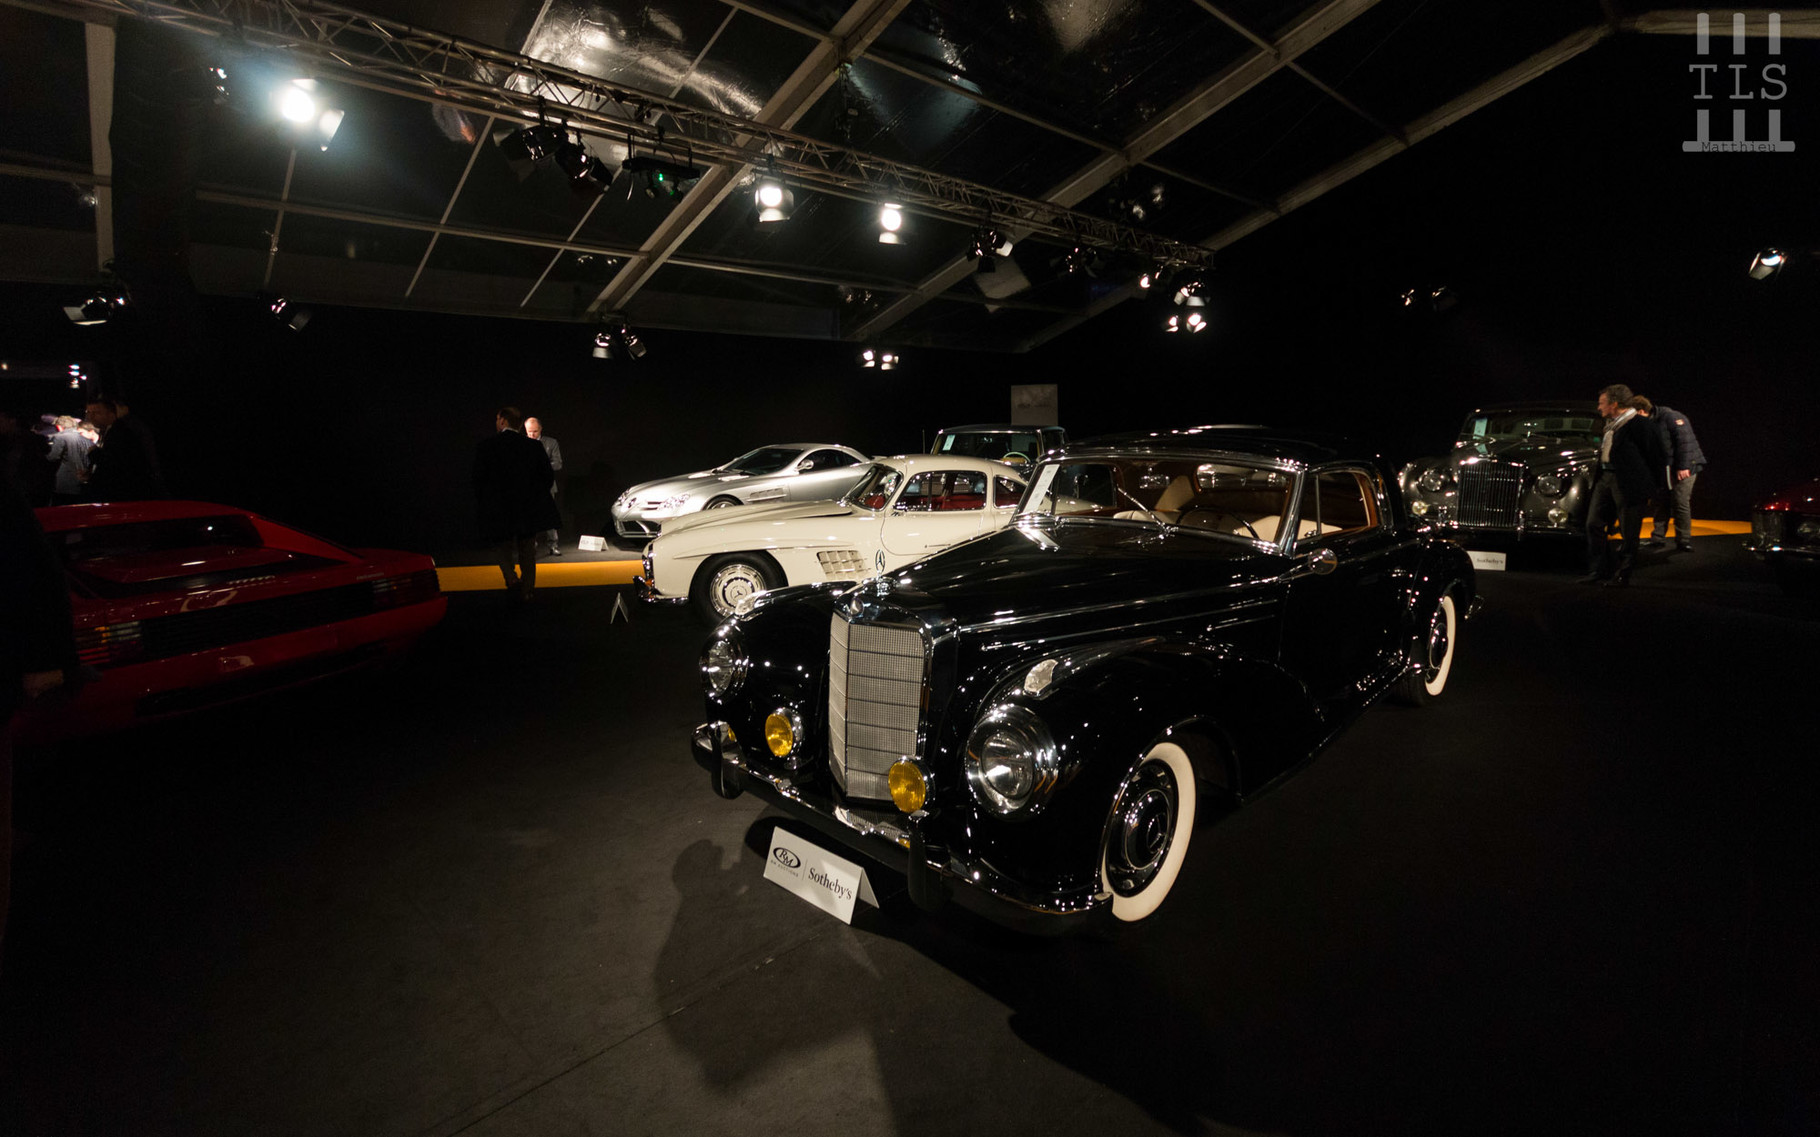 Mercedes-Benz 300 SC, vendue à 498 400 euros.